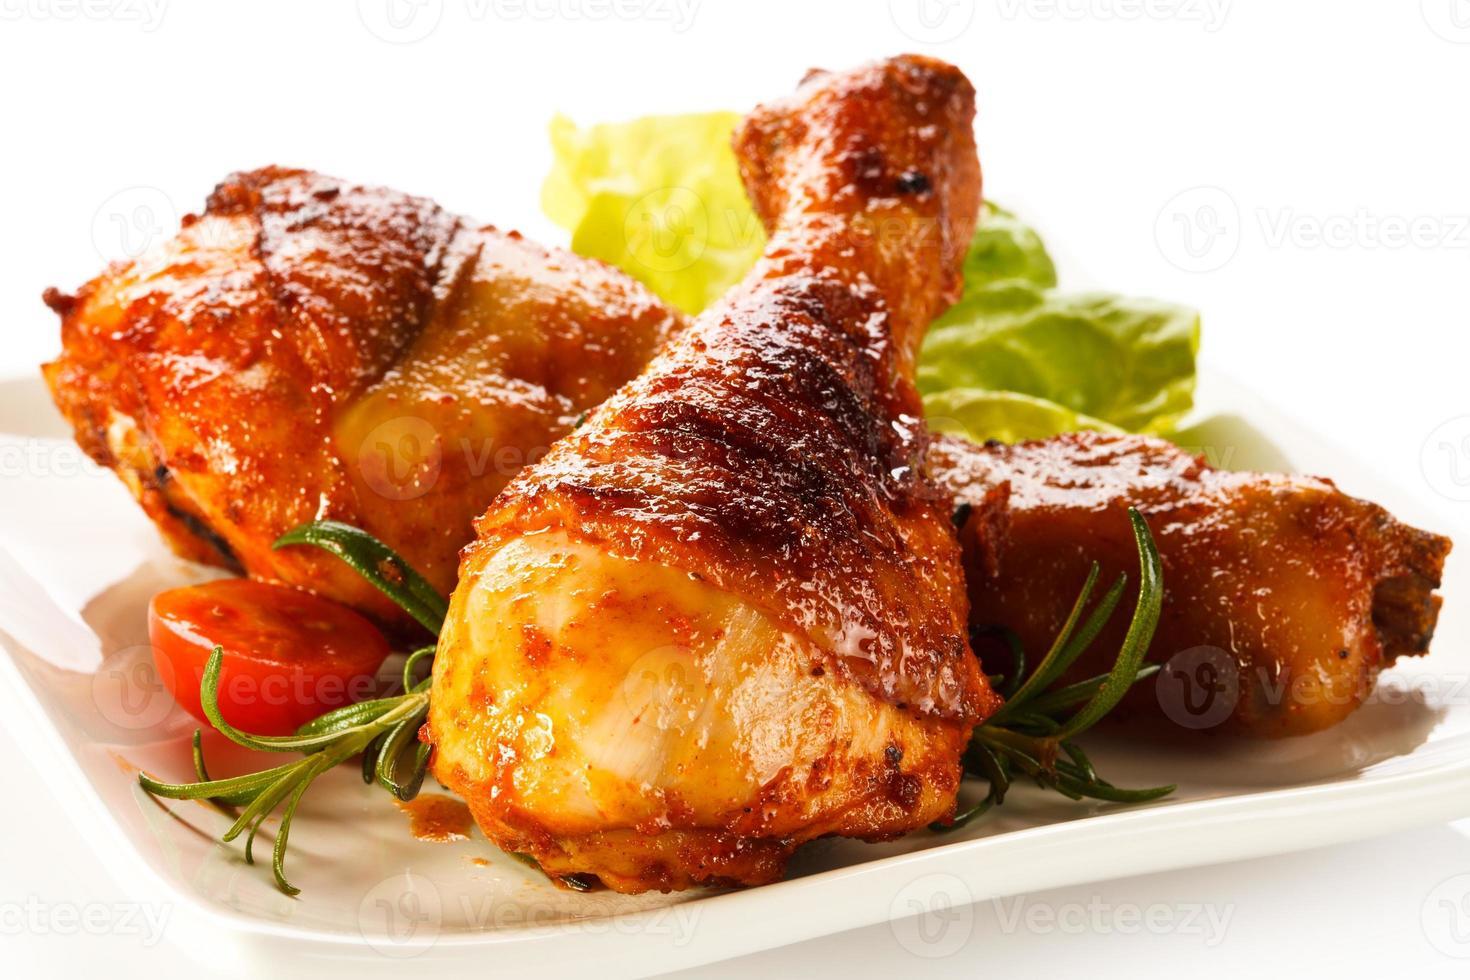 Roasted chicken legs photo